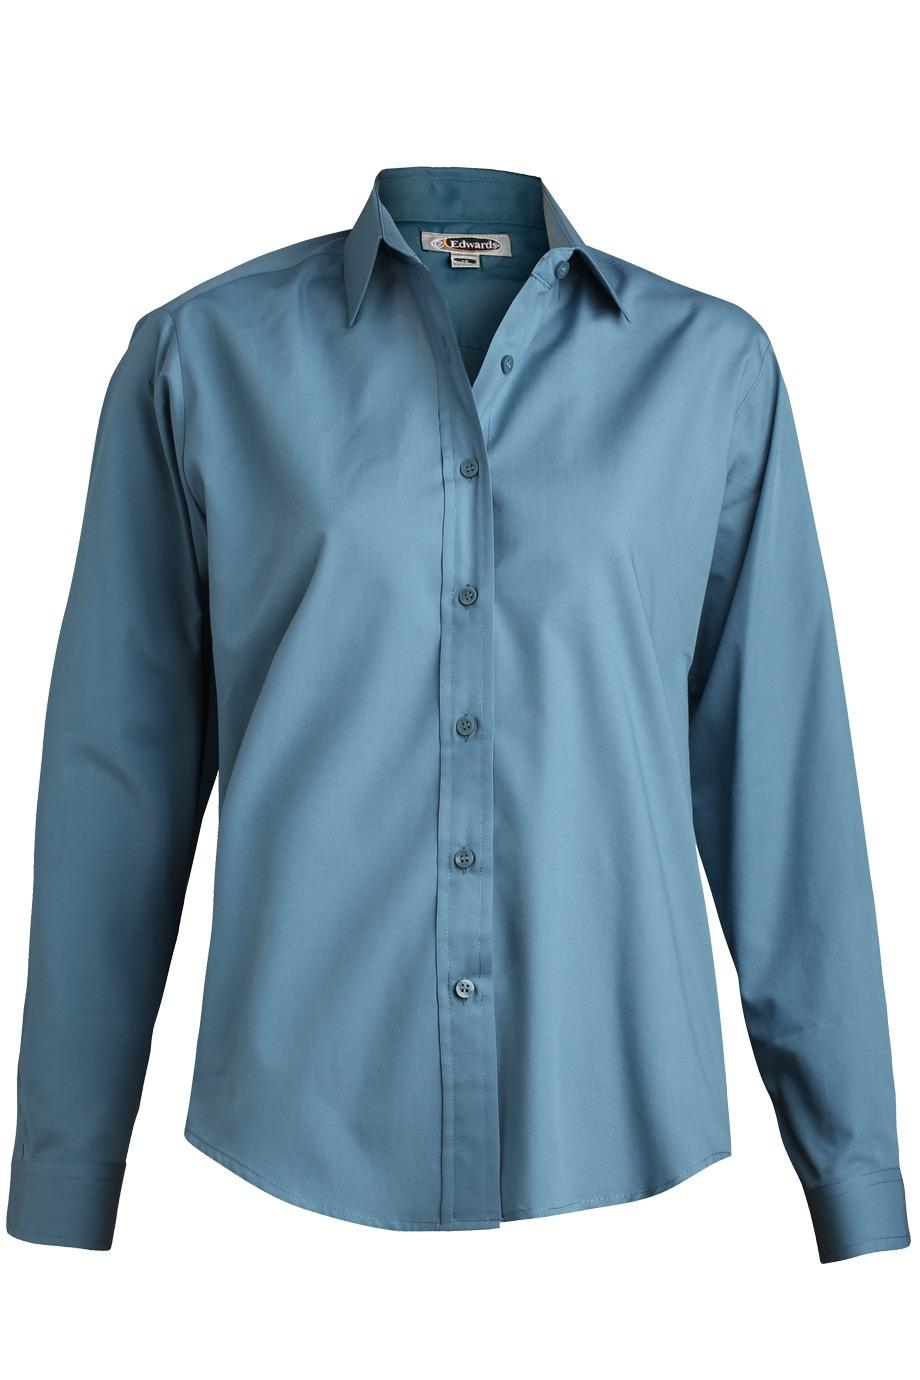 Edwards Garment 5363 - Women's Long Sleeve Value Broadcloth Shirt